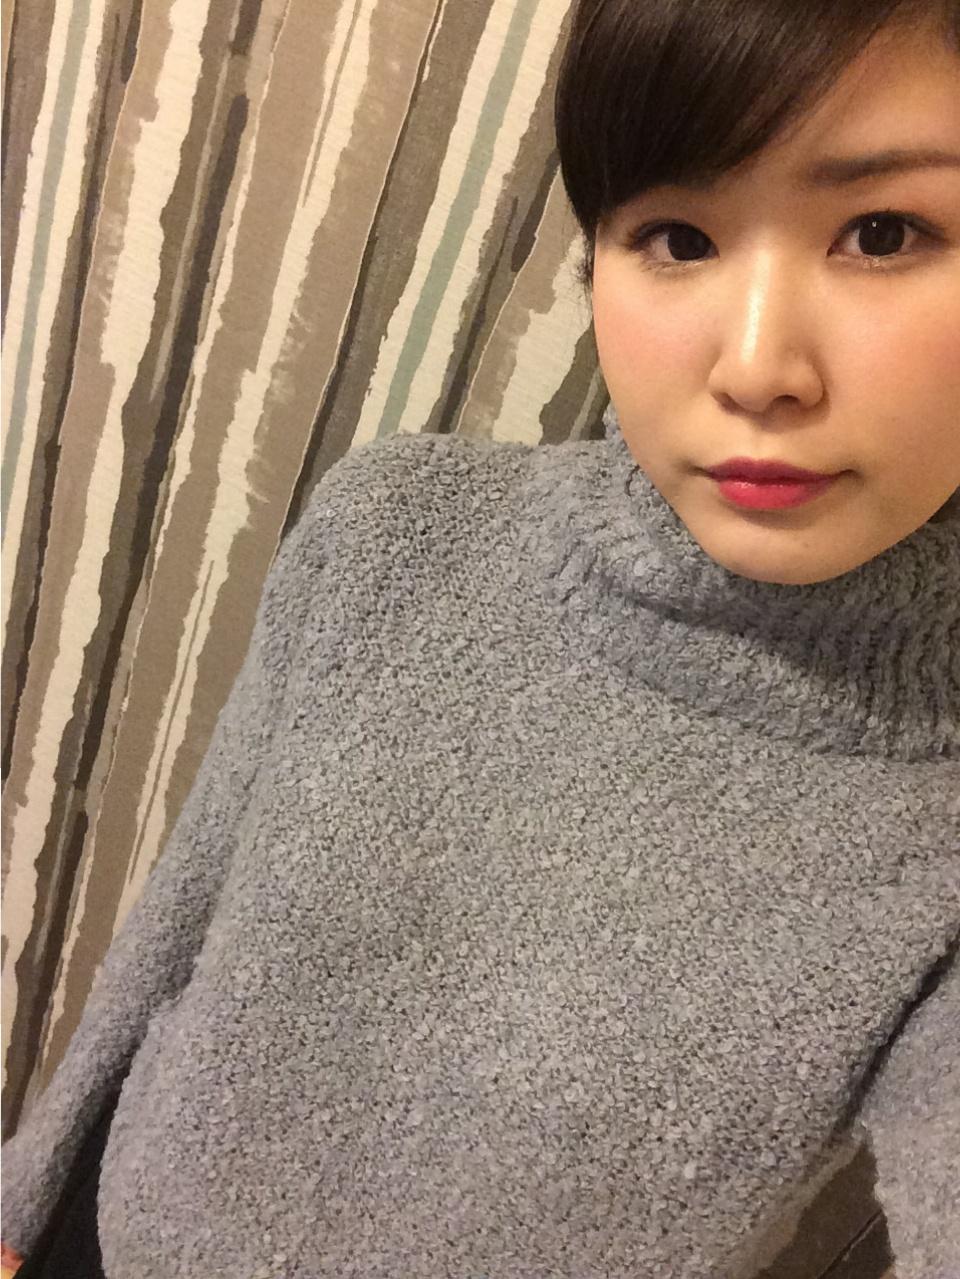 【GU】フワモコセーターで寒い冬に備えよう♡_1